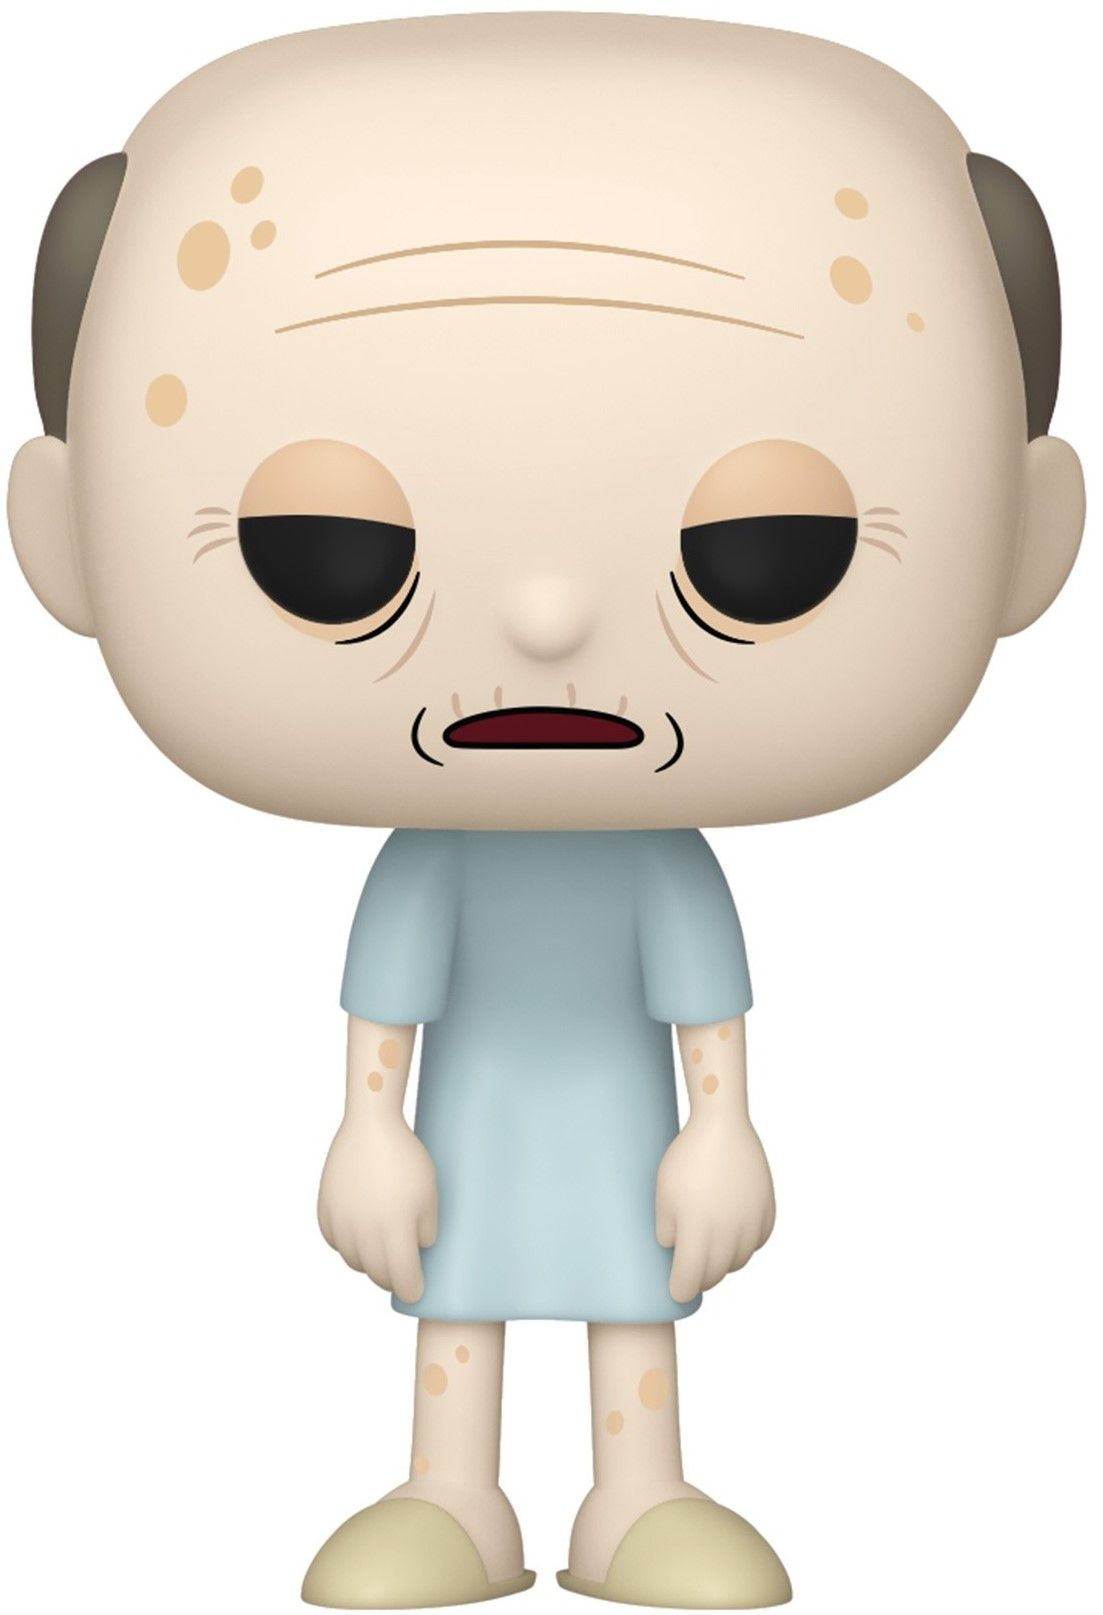 Фигура Funko Pop! Animation: Rick & Morty - Hospice Morty, #693 - 1